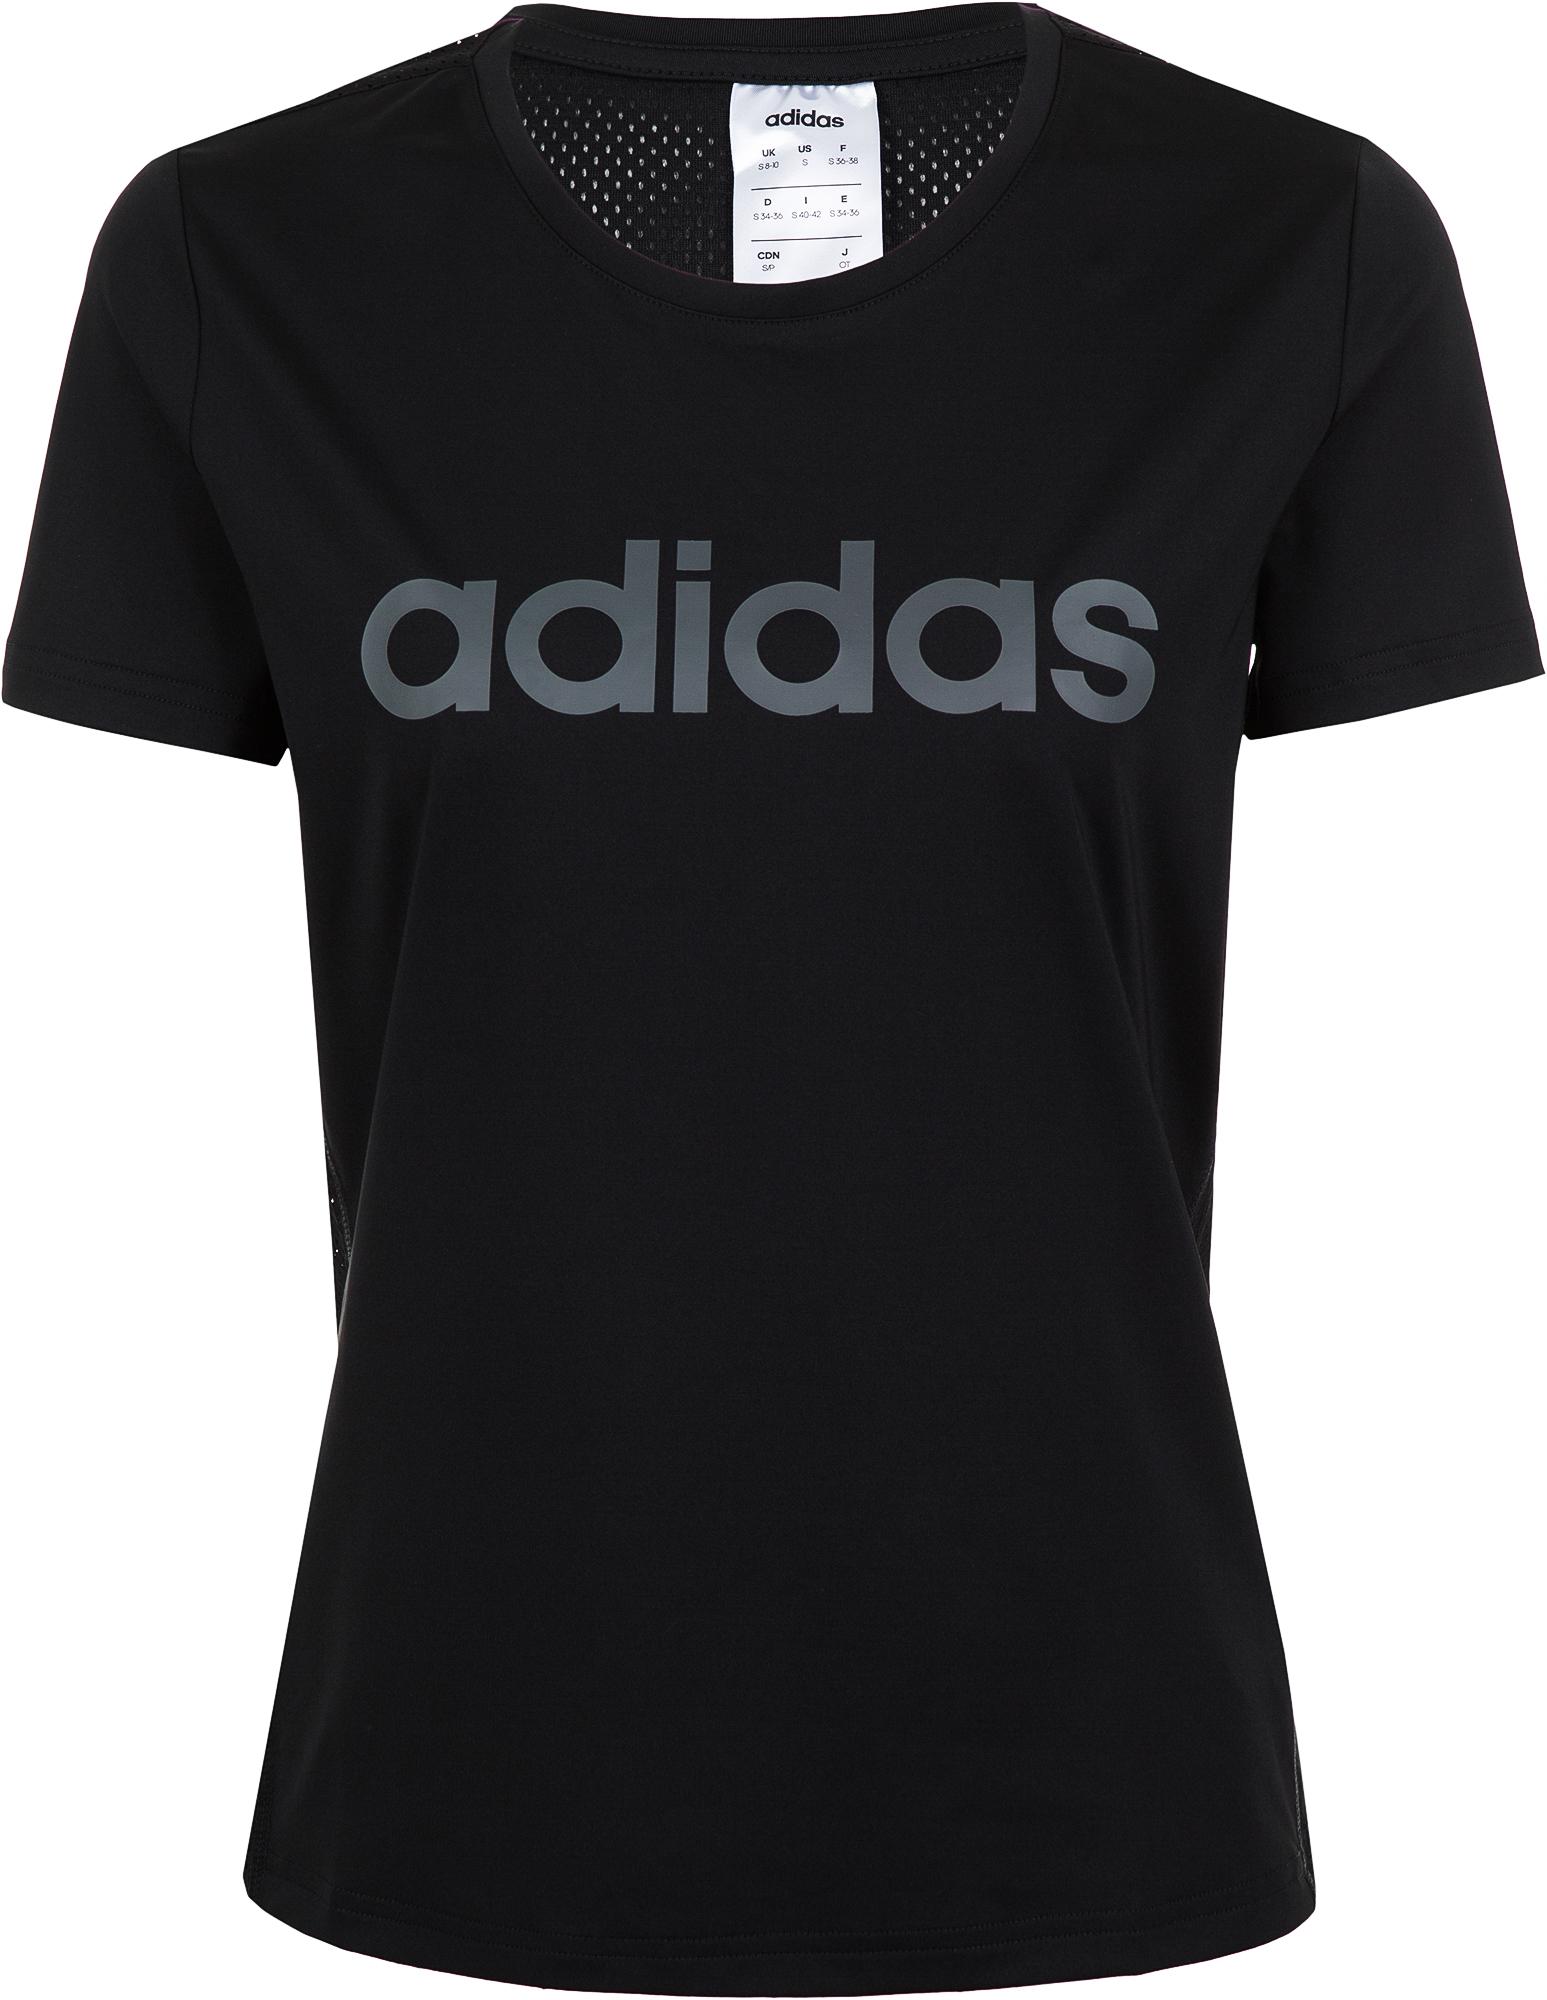 Adidas Футболка женская Adidas Design 2 Move Logo, размер 54-56 цена